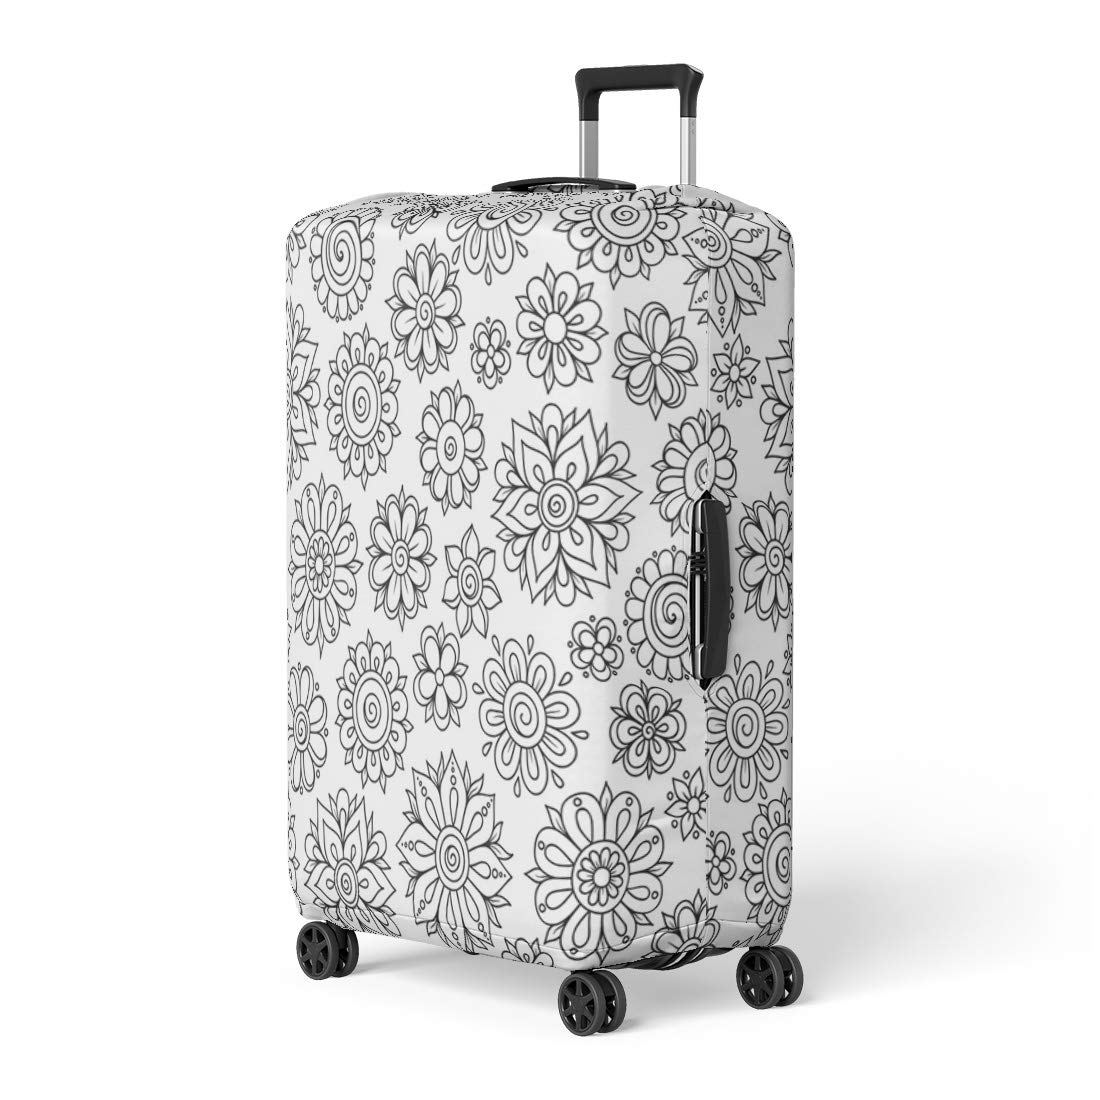 c049072918b6 Amazon.com: Pinbeam Luggage Cover Brown Color Retro Nautical World ...